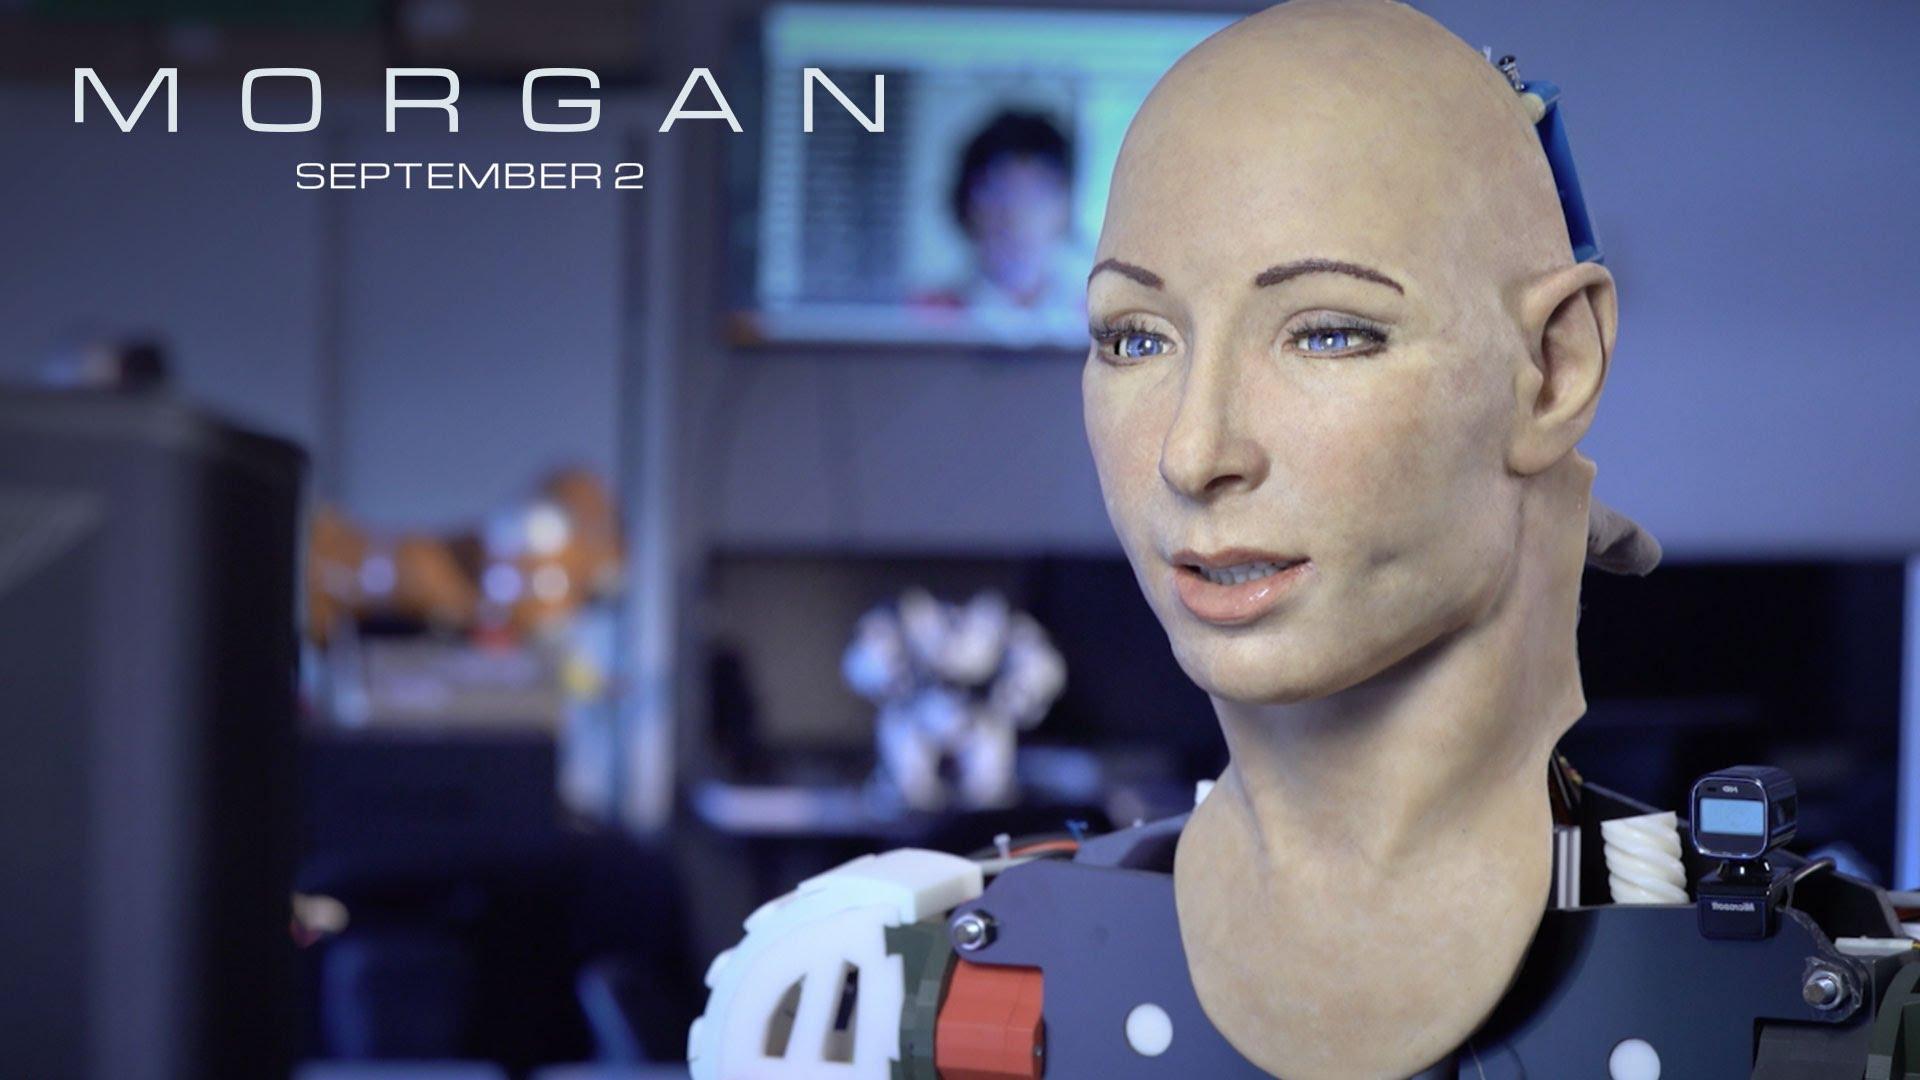 Morgan | Humans & Machines [HD] | 20th Century FOX